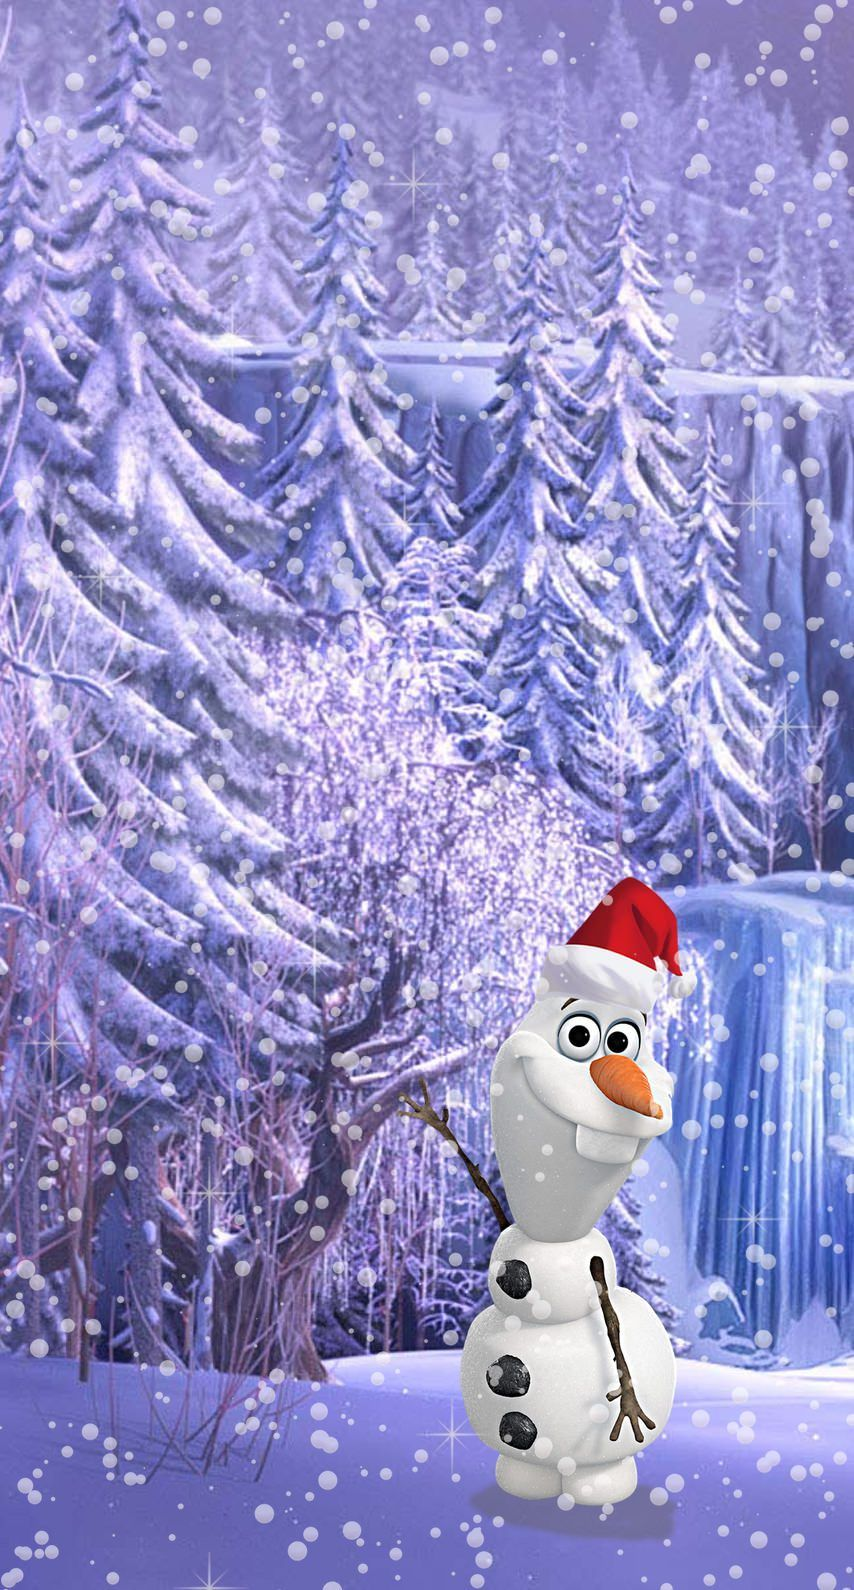 Iphone Wall Christmas Frozen Tjn Cute Disney Wallpaper Disney Wallpaper Frozen Wallpaper